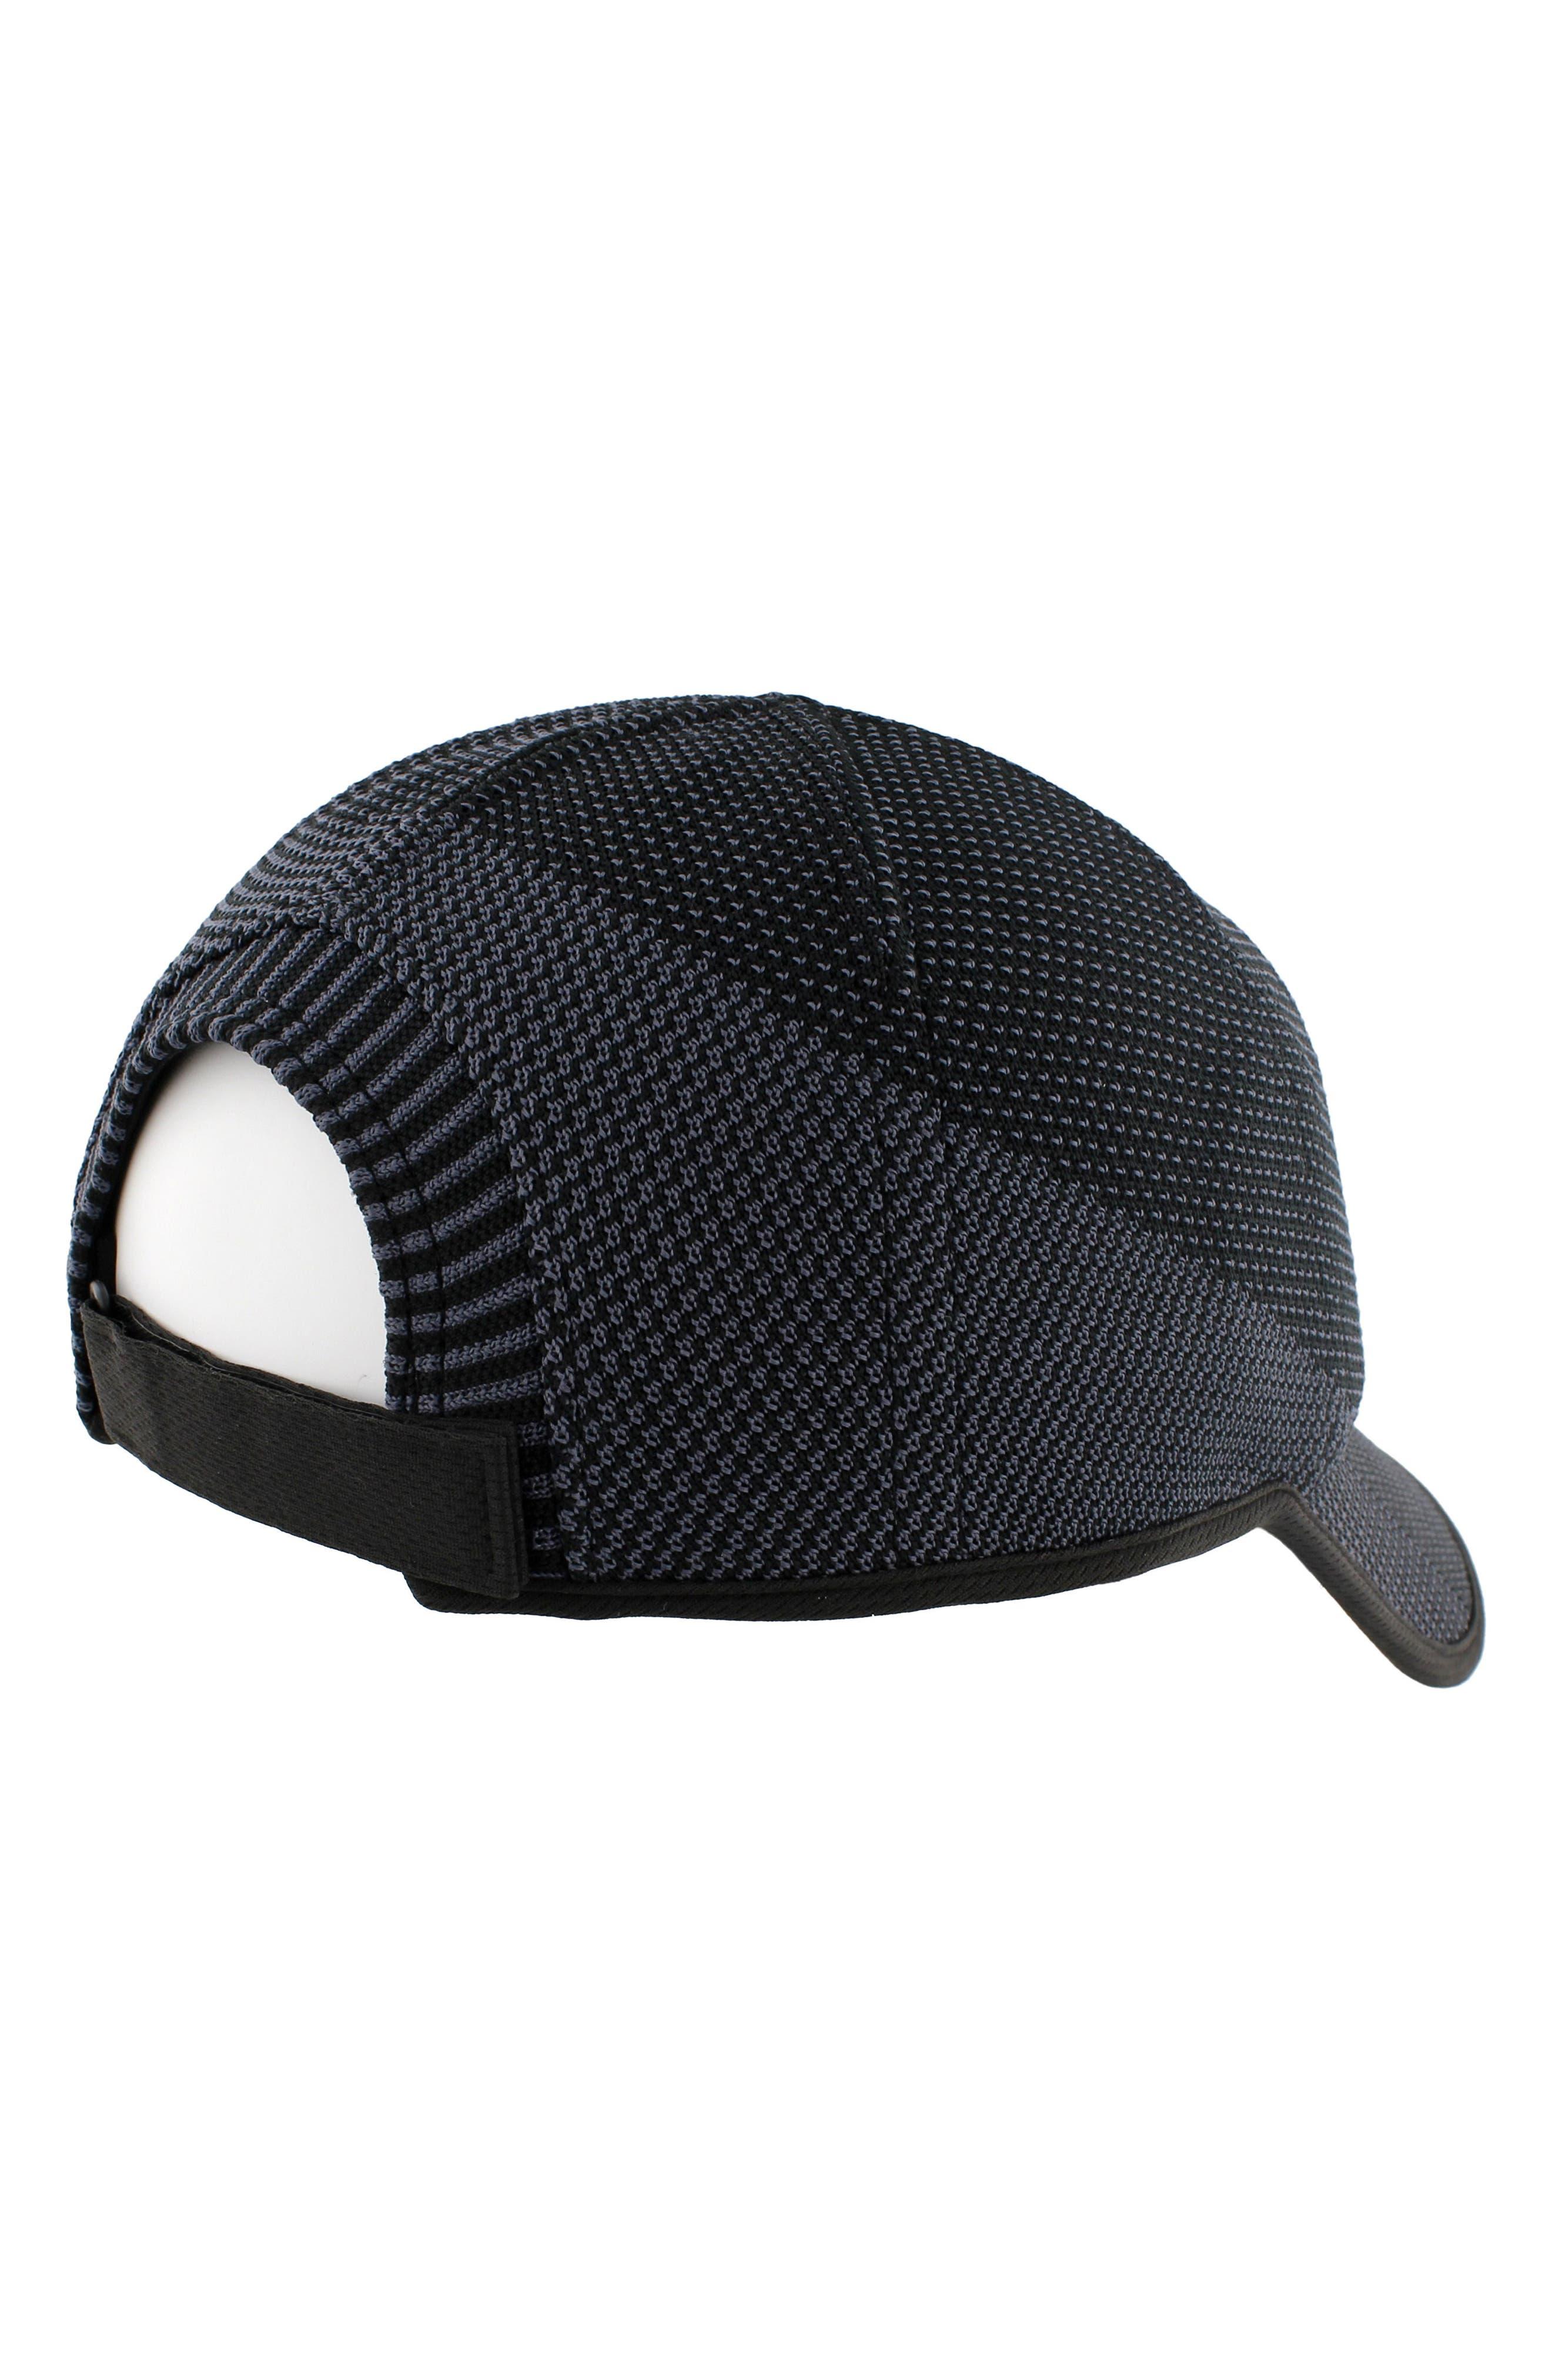 NMD Prime Ball Cap,                             Alternate thumbnail 5, color,                             Black